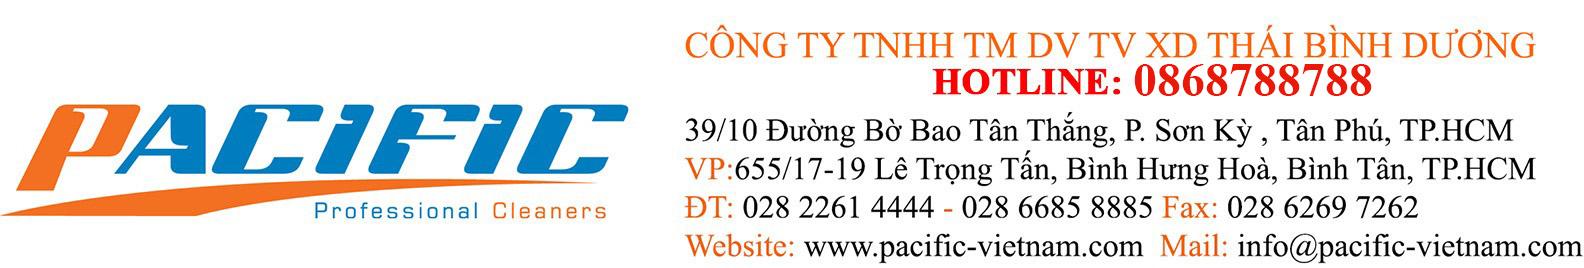 PACIFIC-VIETNAM